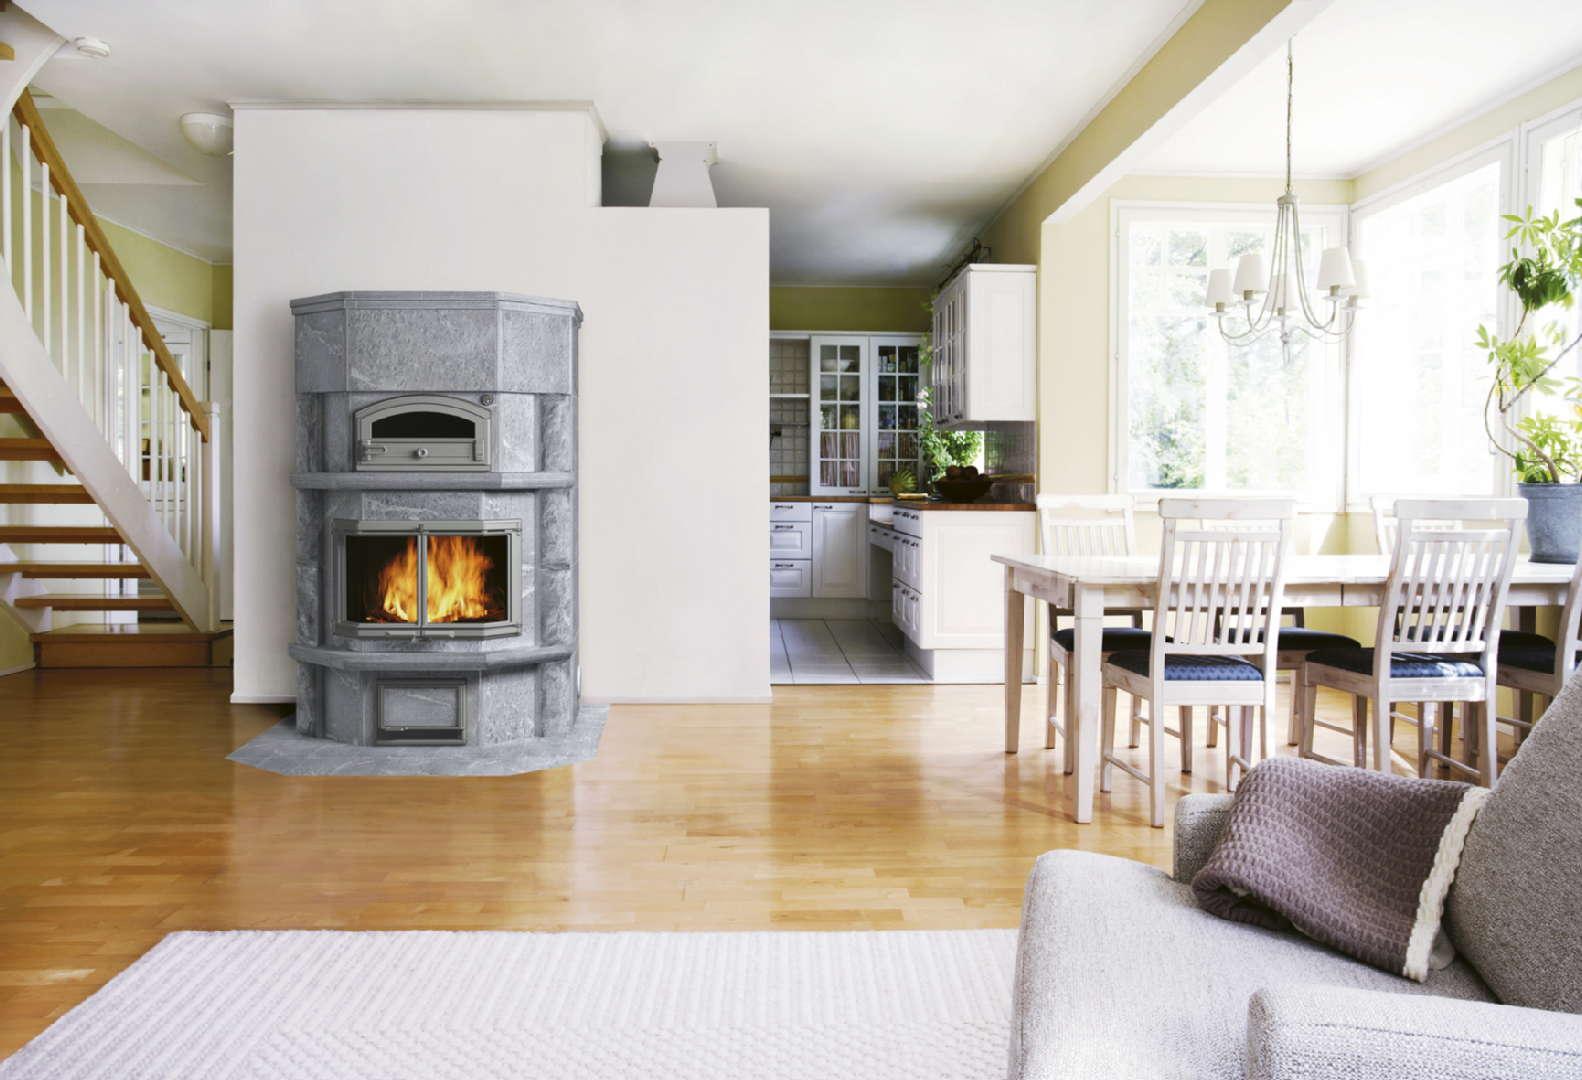 perinteinen moderni olohuone ruokailutila takkahuone sisustus olohuone tulikivi. Black Bedroom Furniture Sets. Home Design Ideas